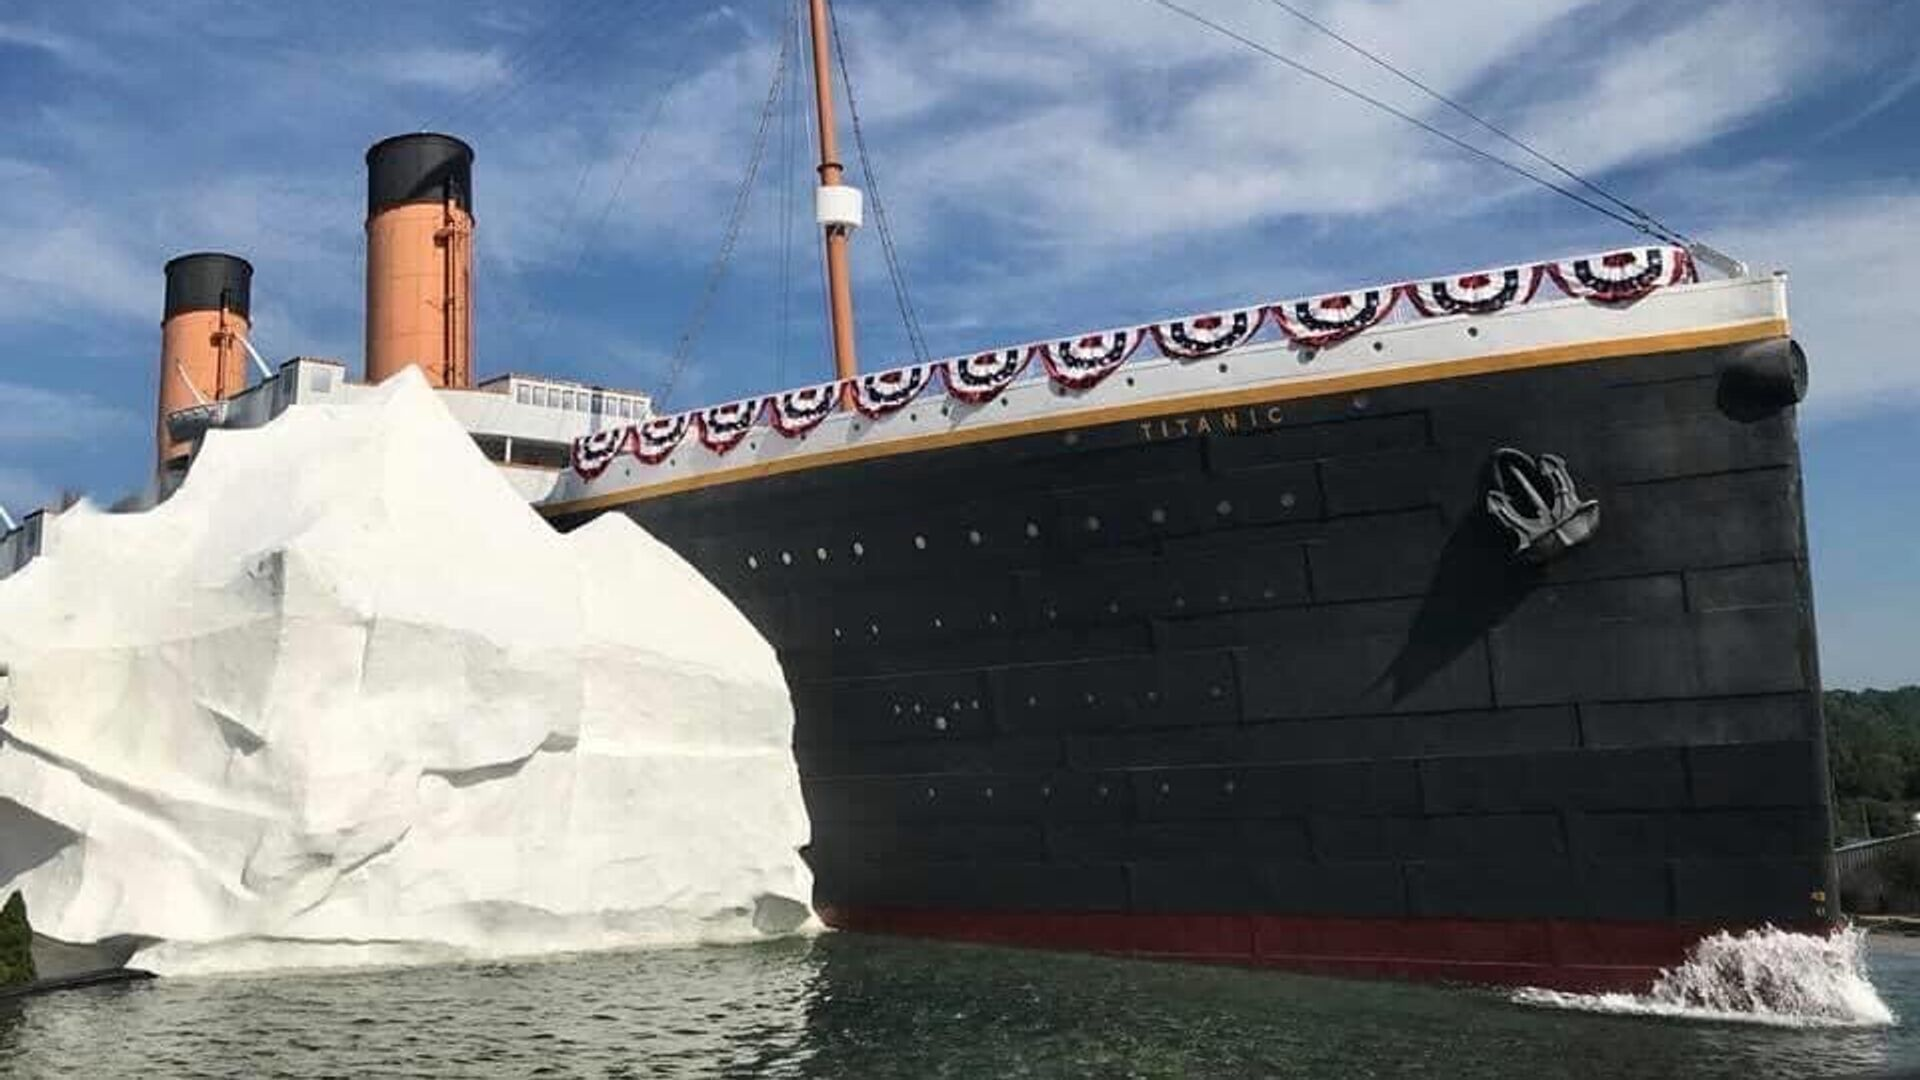 Музей Титаника в Пиджен-Фордж, США - РИА Новости, 1920, 03.08.2021